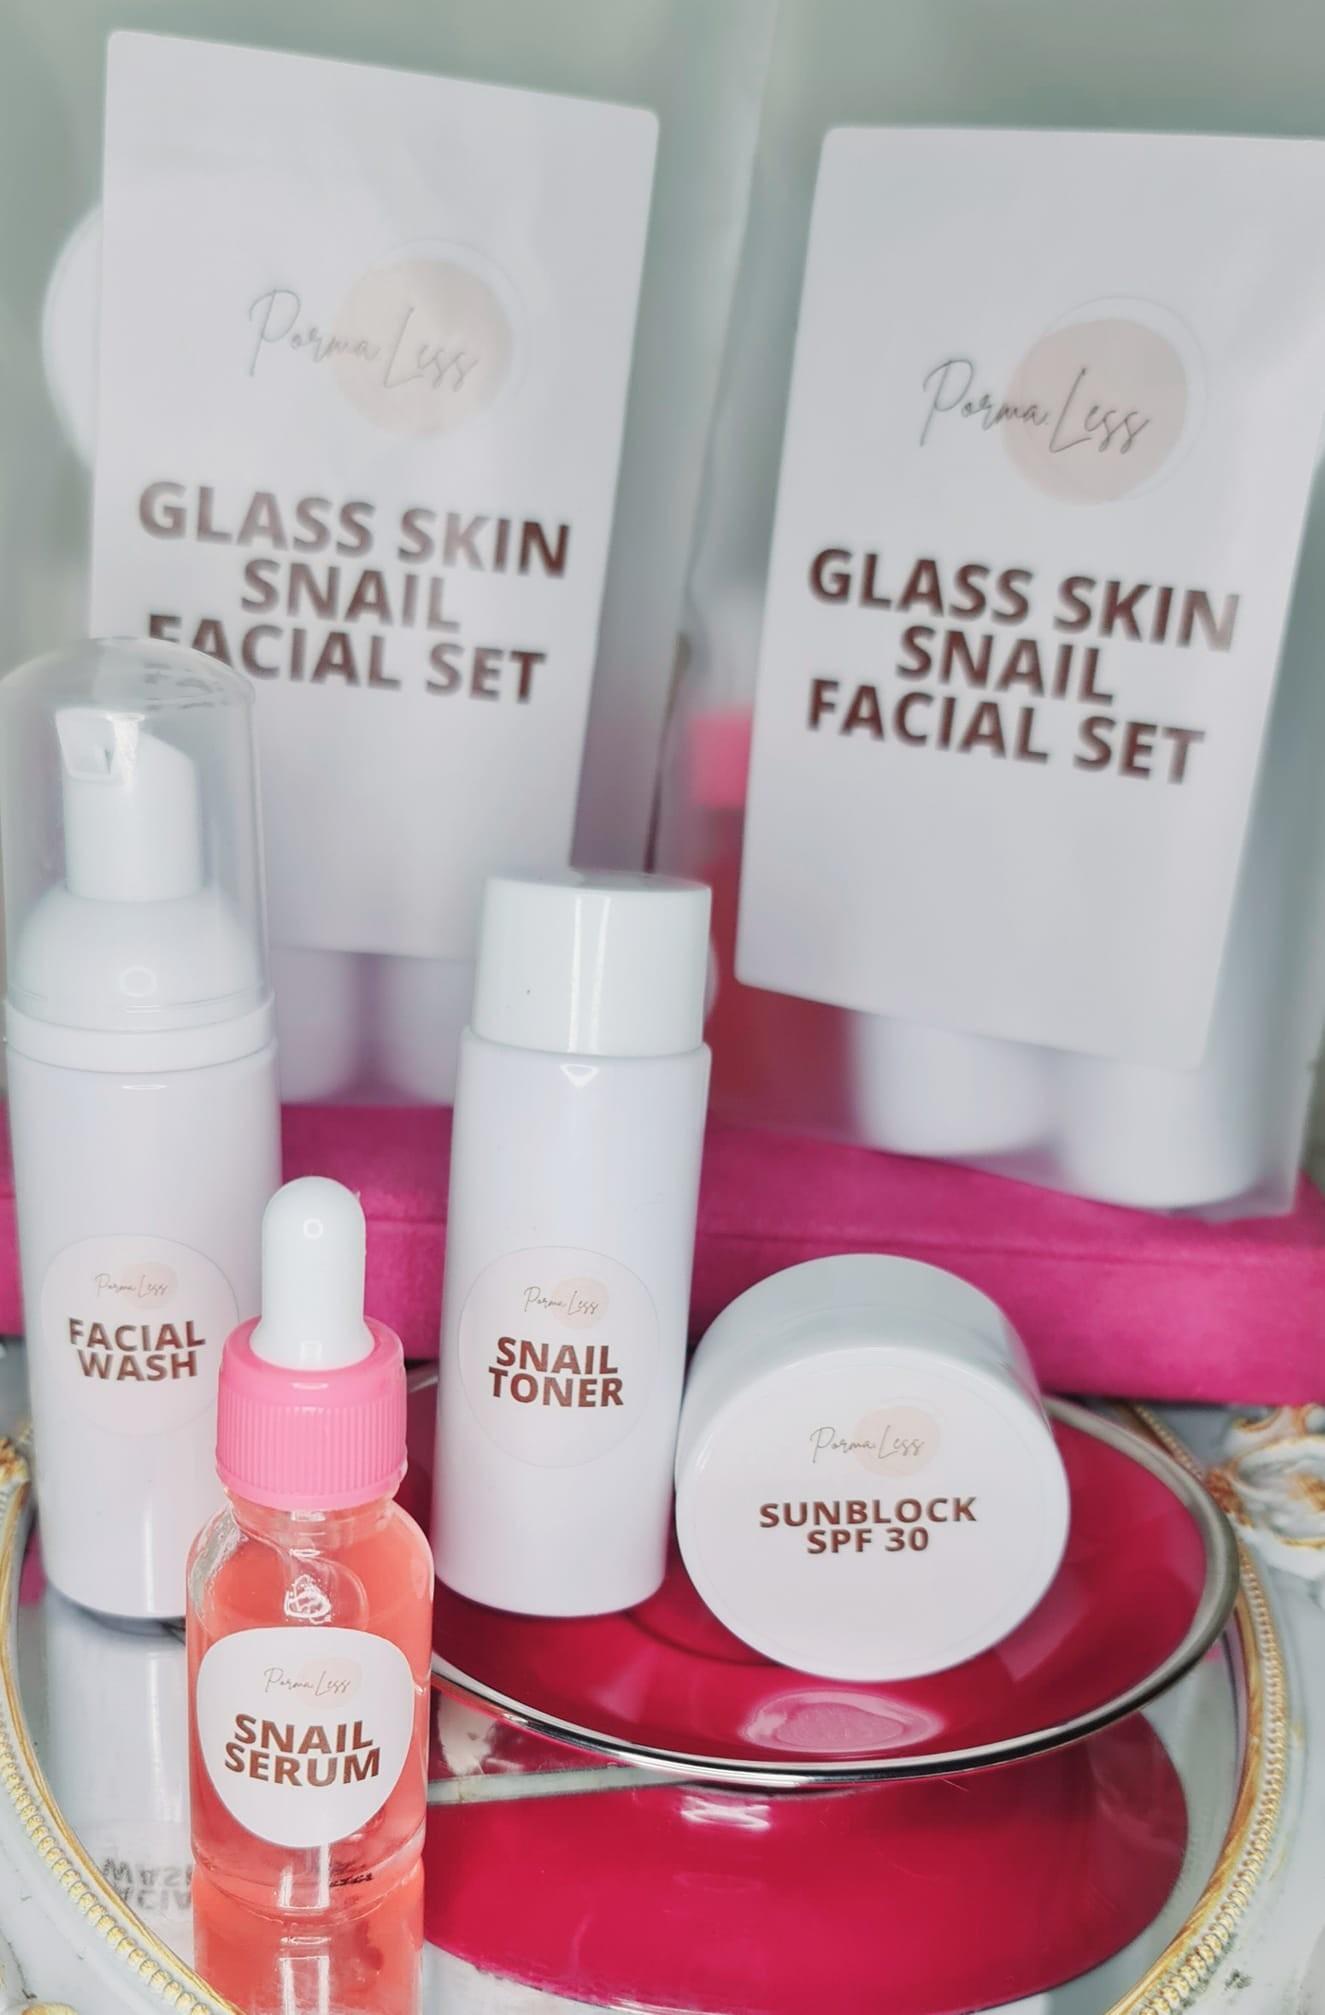 Glass skin set